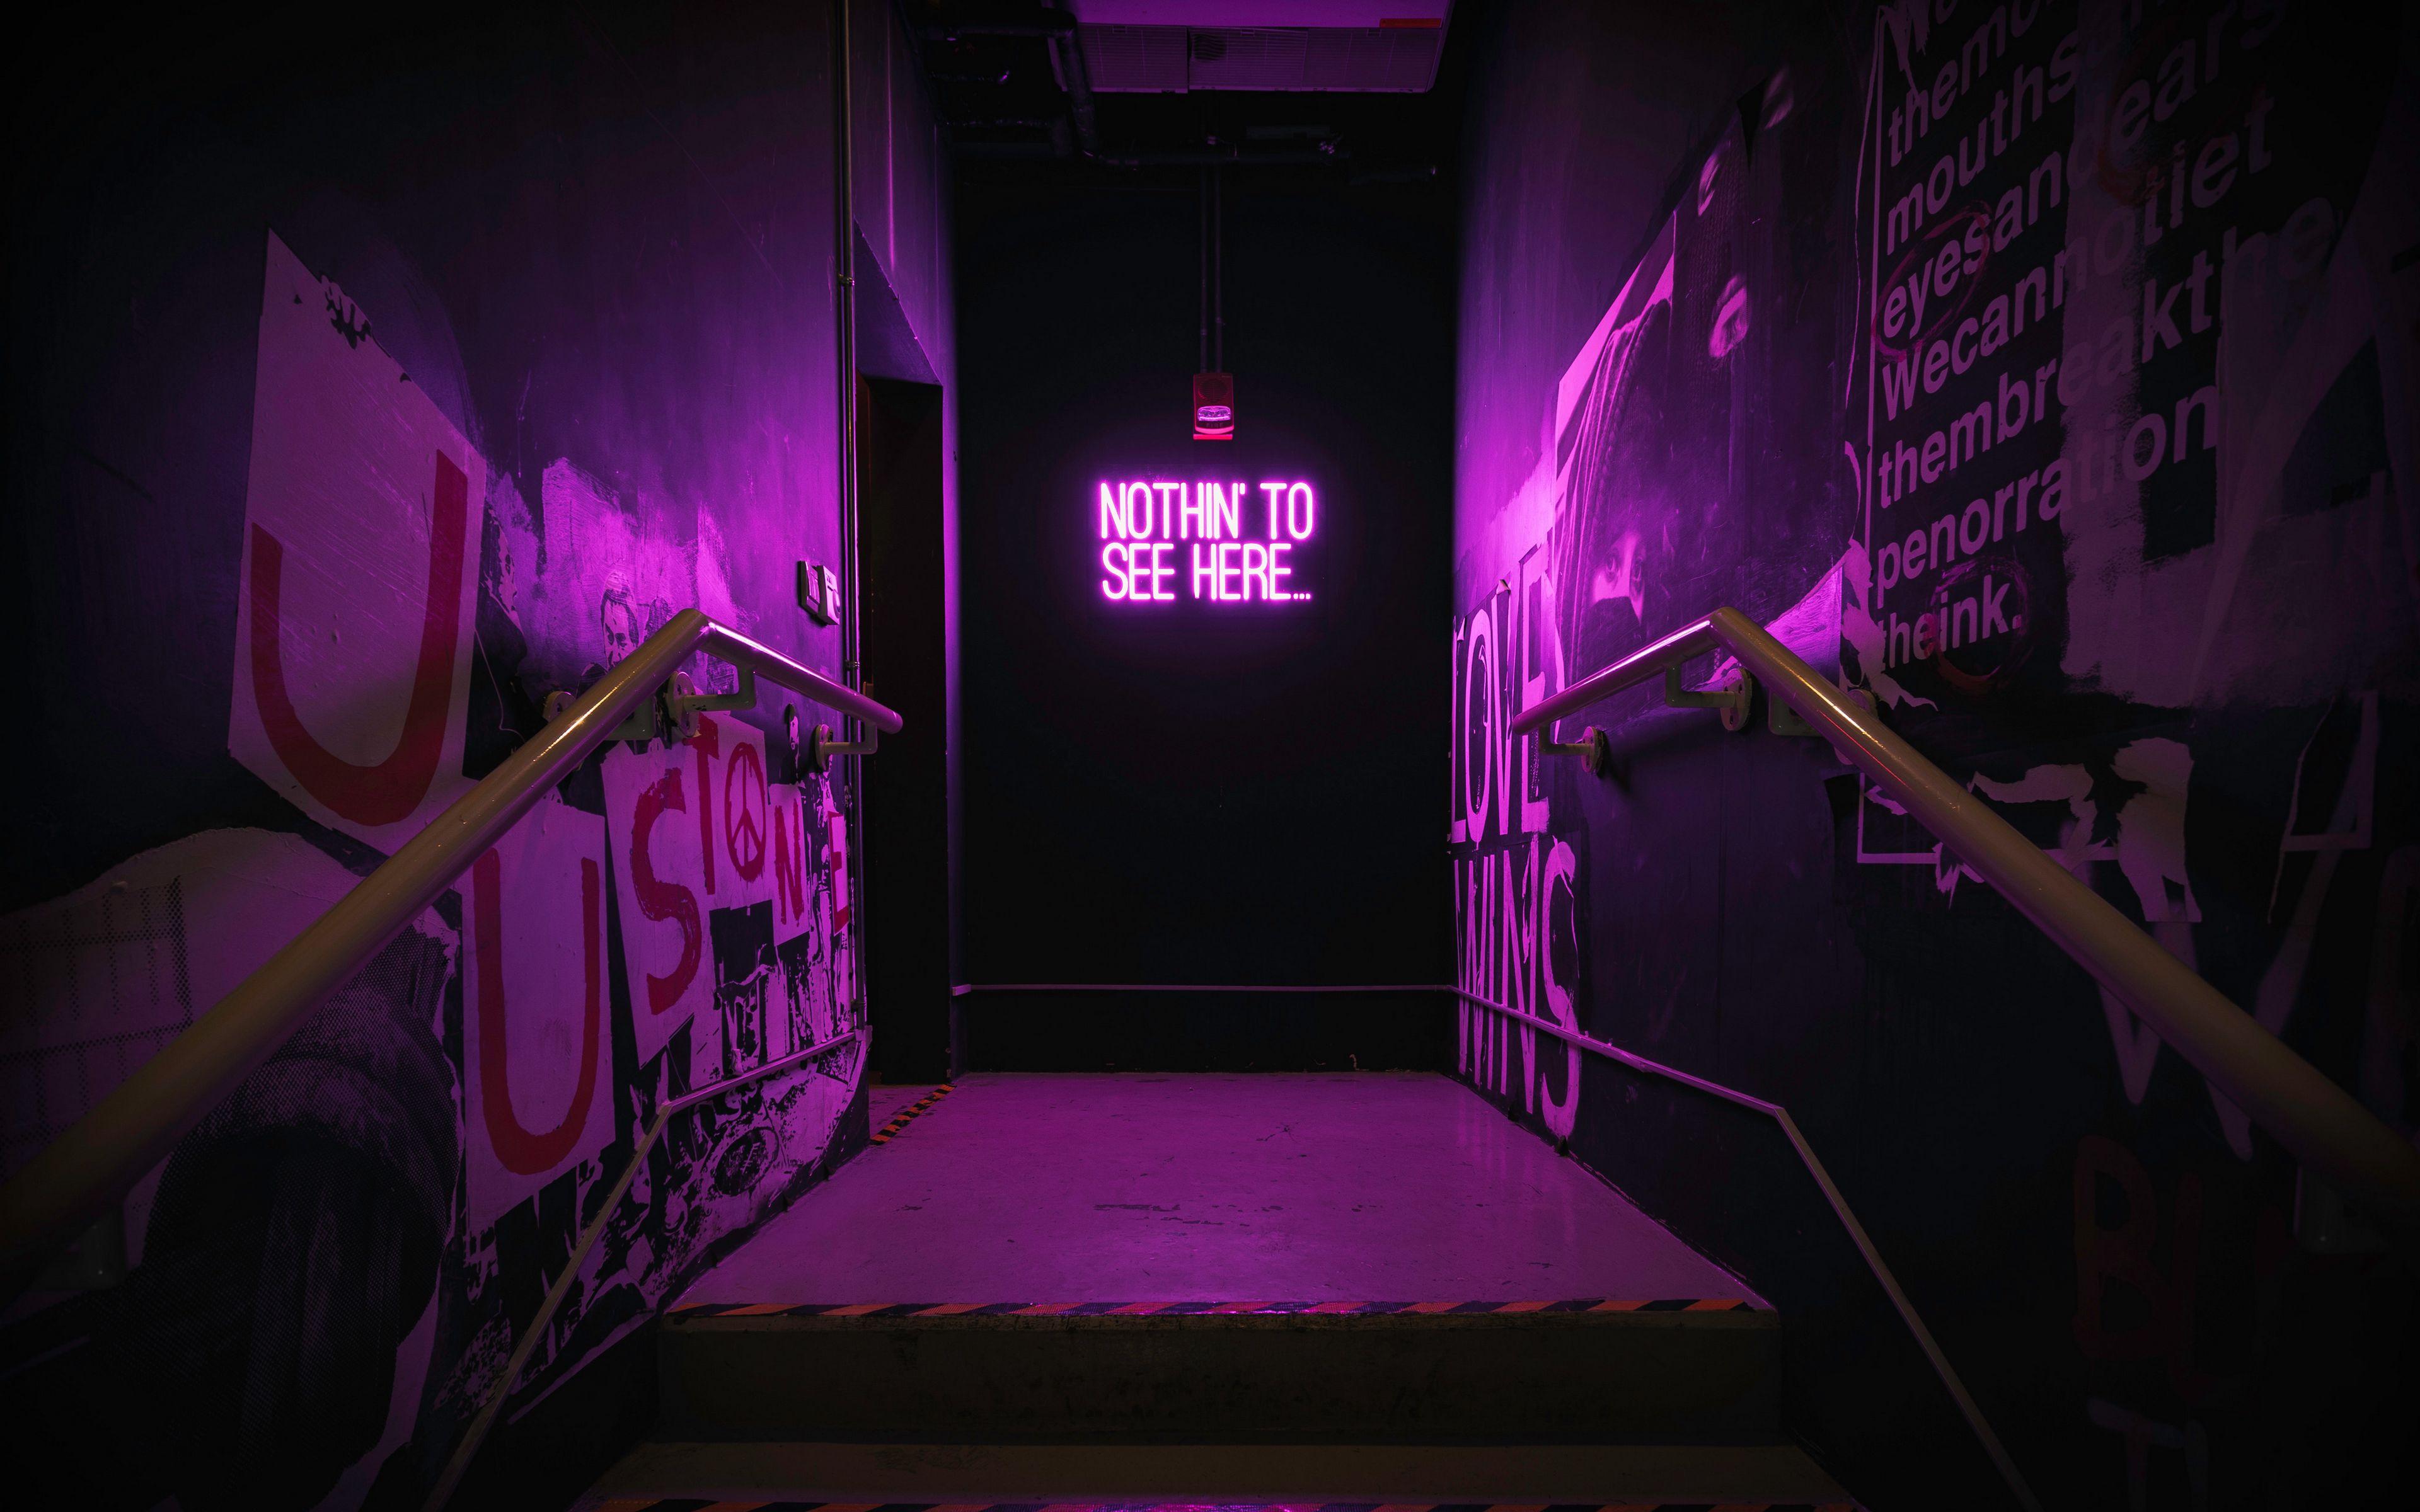 3840x2400 Wallpaper neon, inscription, wall, purple, backlight